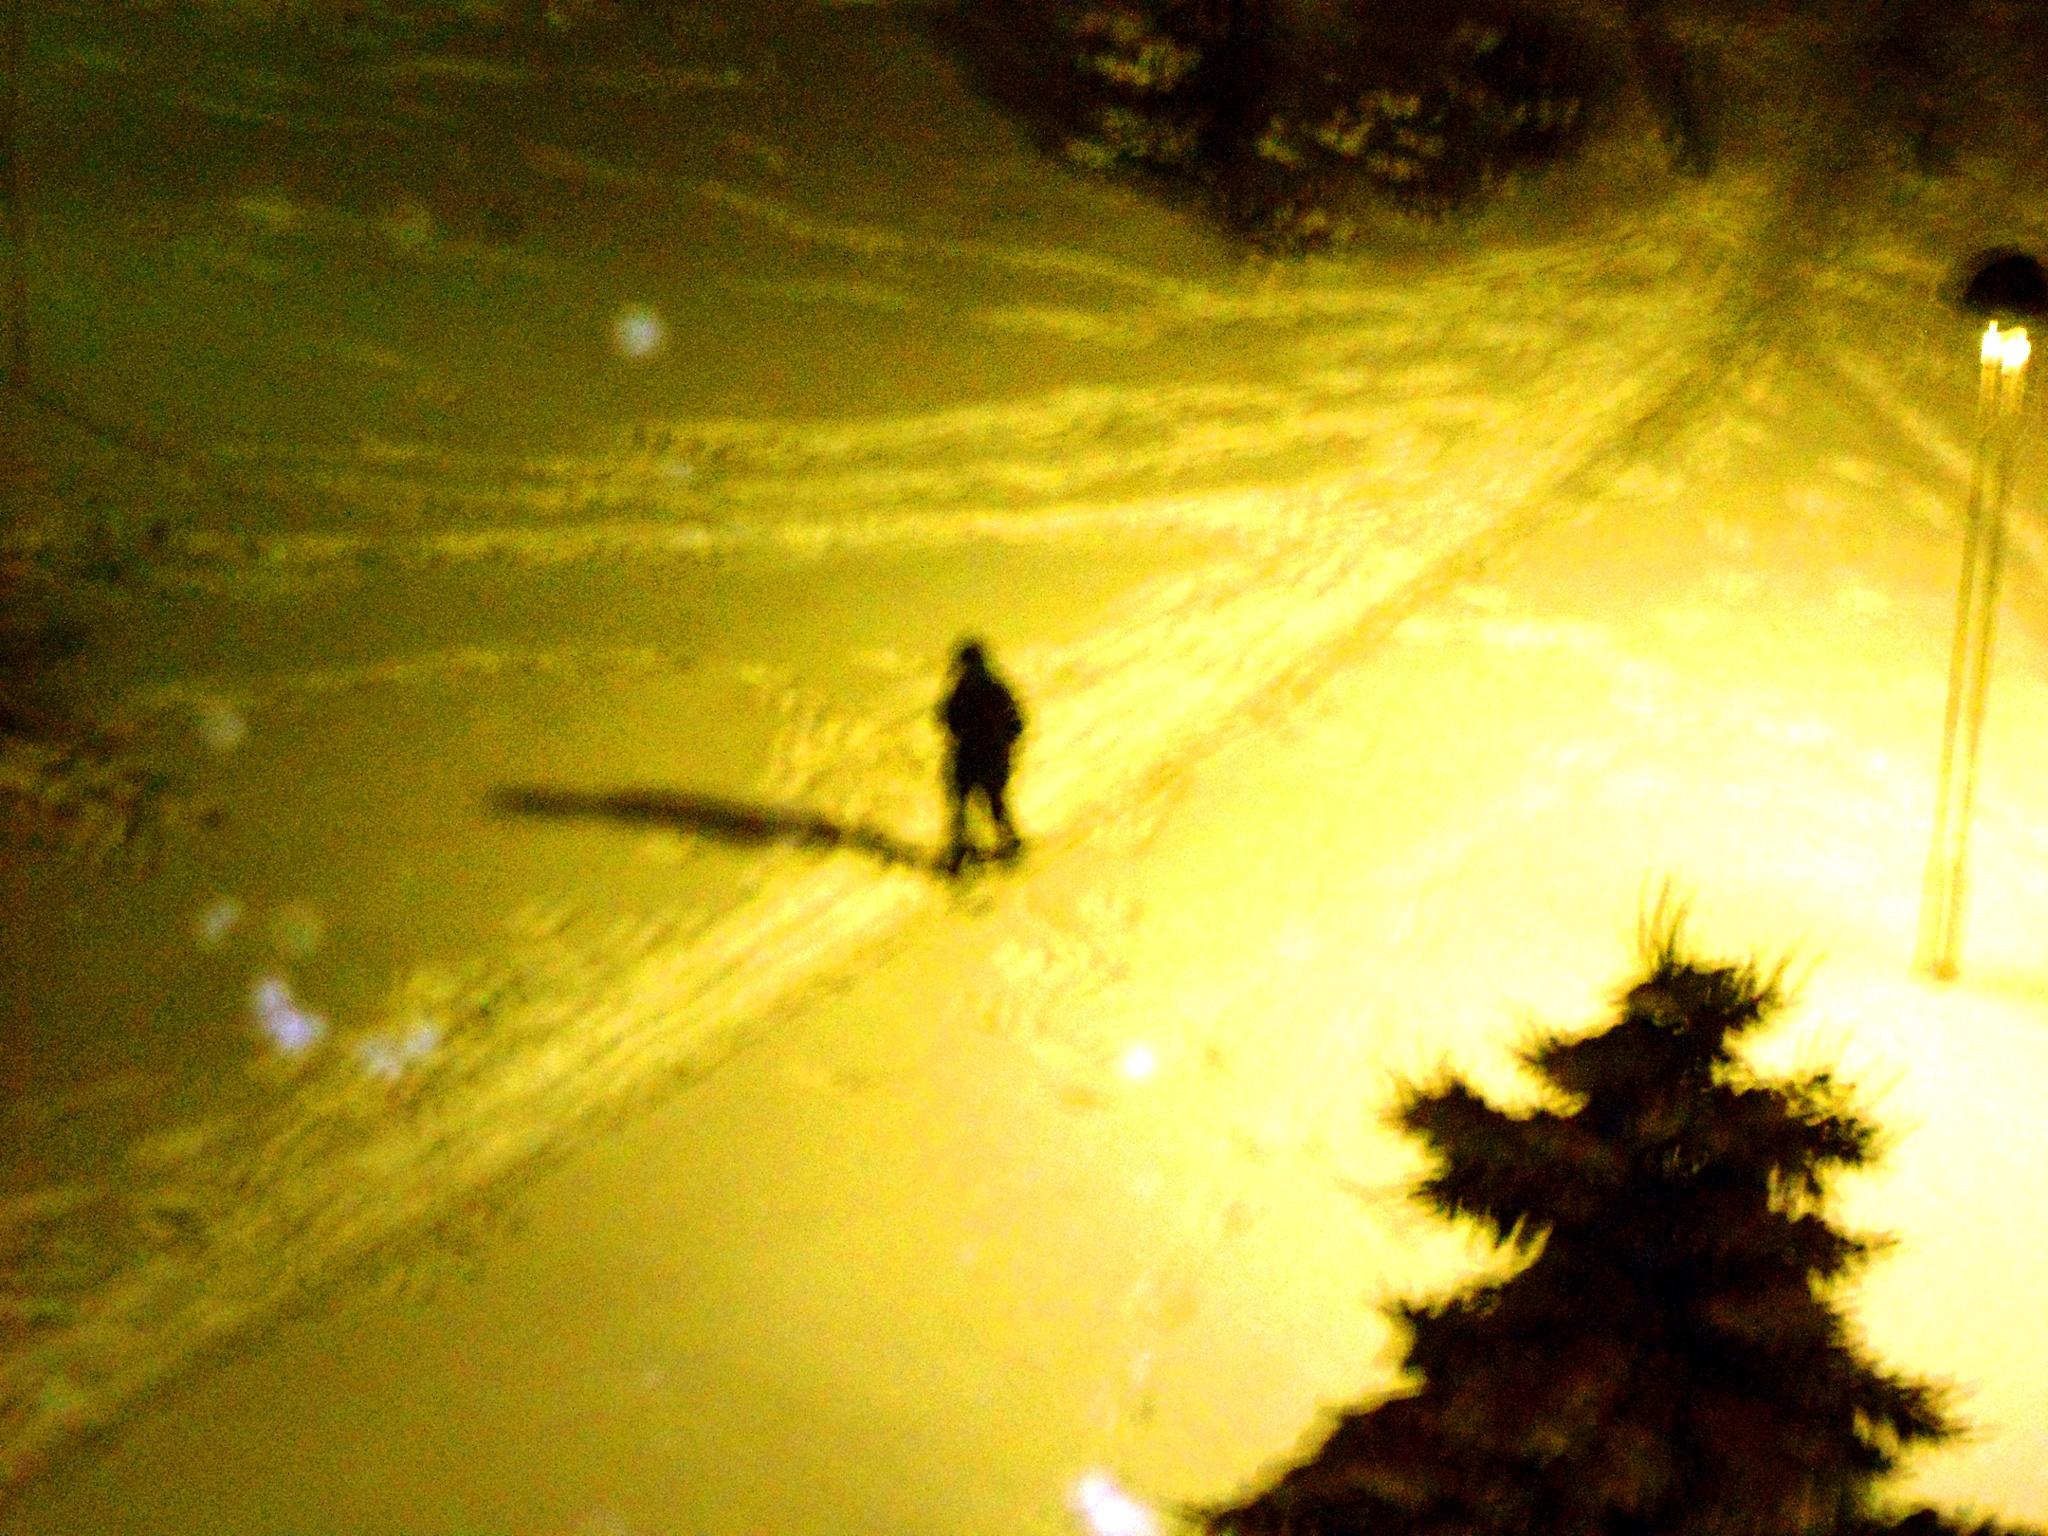 In the winter night by biljanapetrovic1048